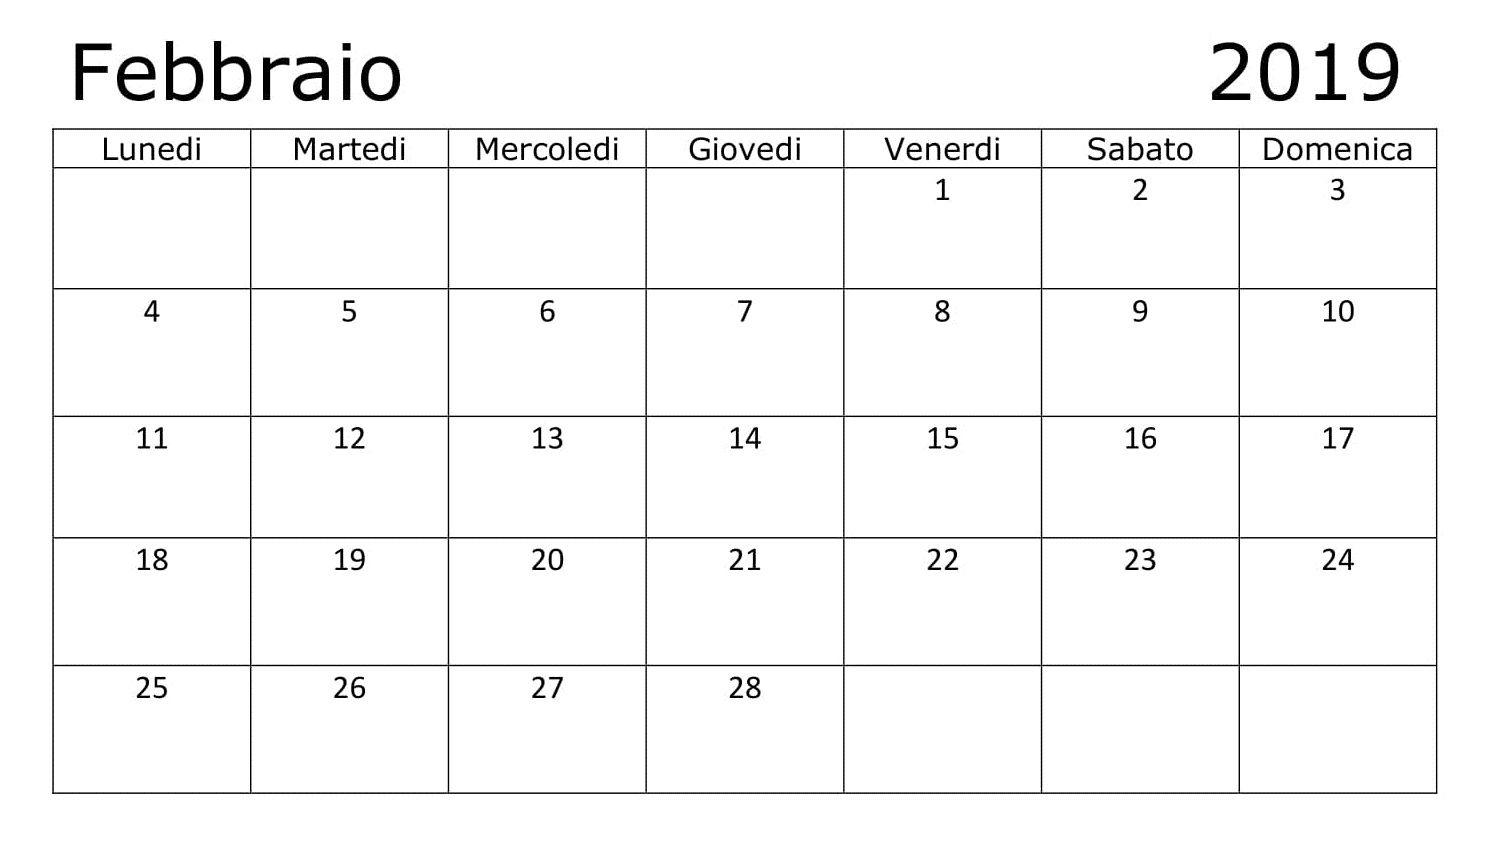 Febbraio 2019 Calendario Computer keyboard, Periodic table